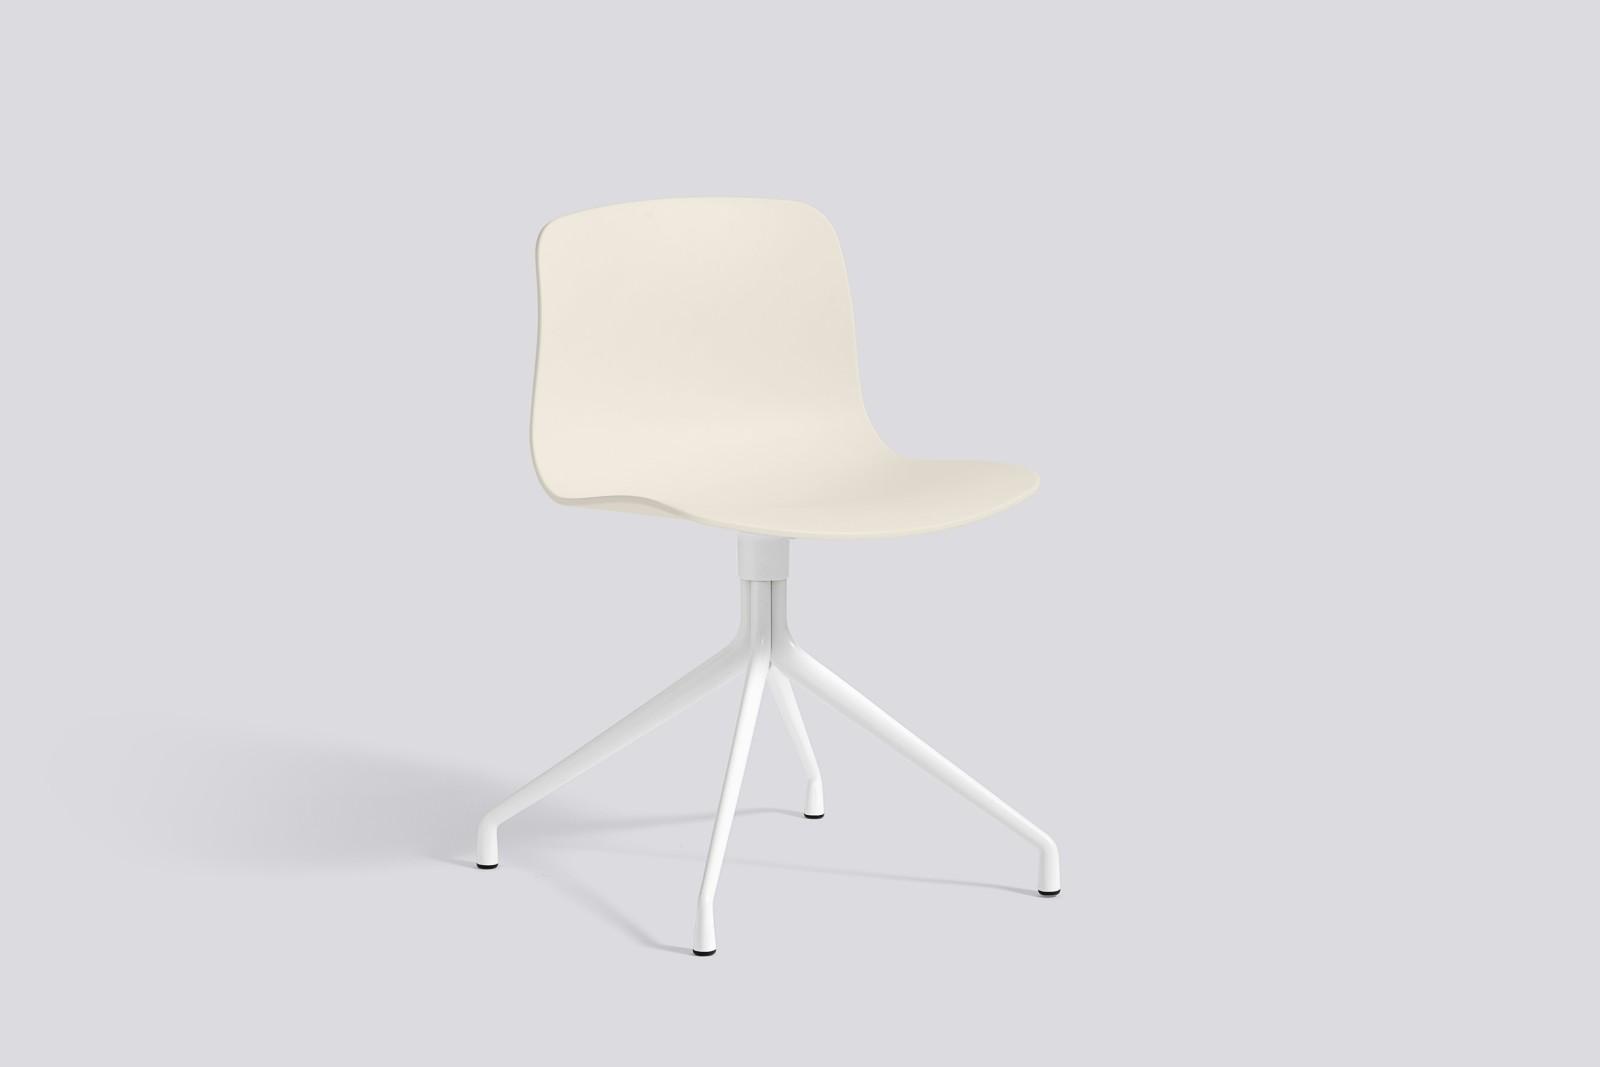 About A Chair AAC10 Cream white, White Powder Coated Aluminium